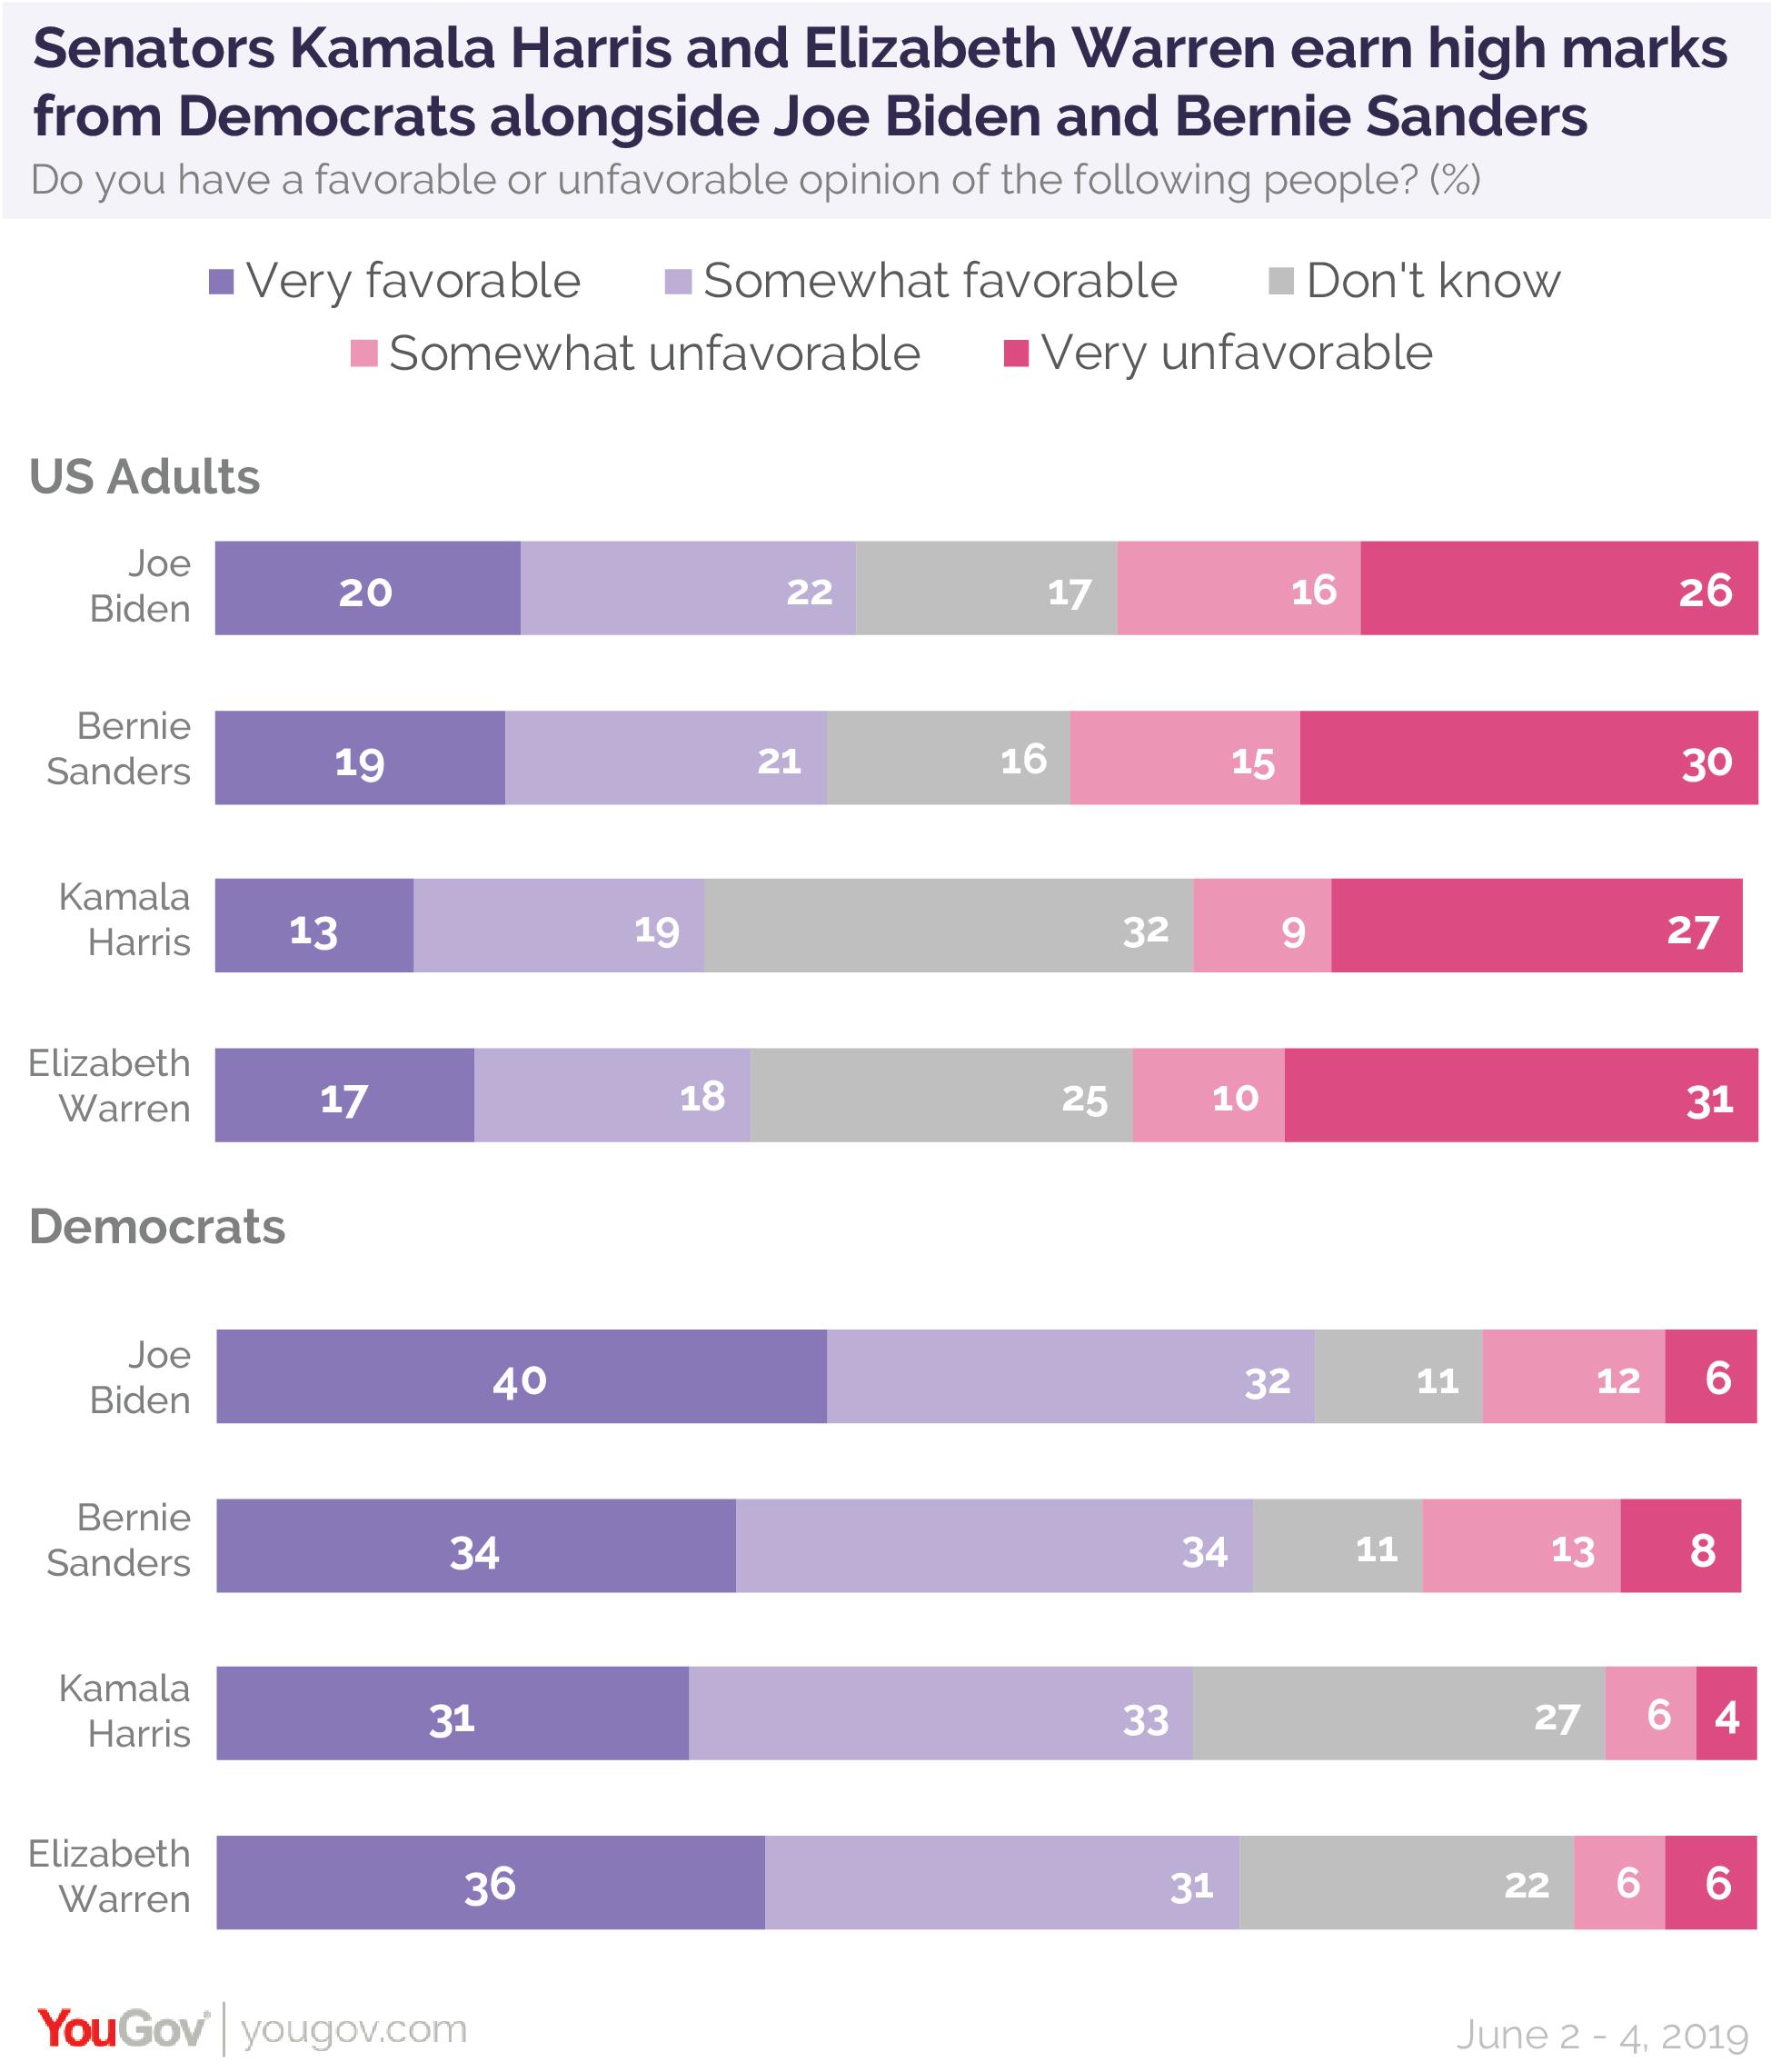 Senators Kamala Harris and Elizabeth Warren earn high marks from Democrats along with Joe Biden and Bernie Sanders